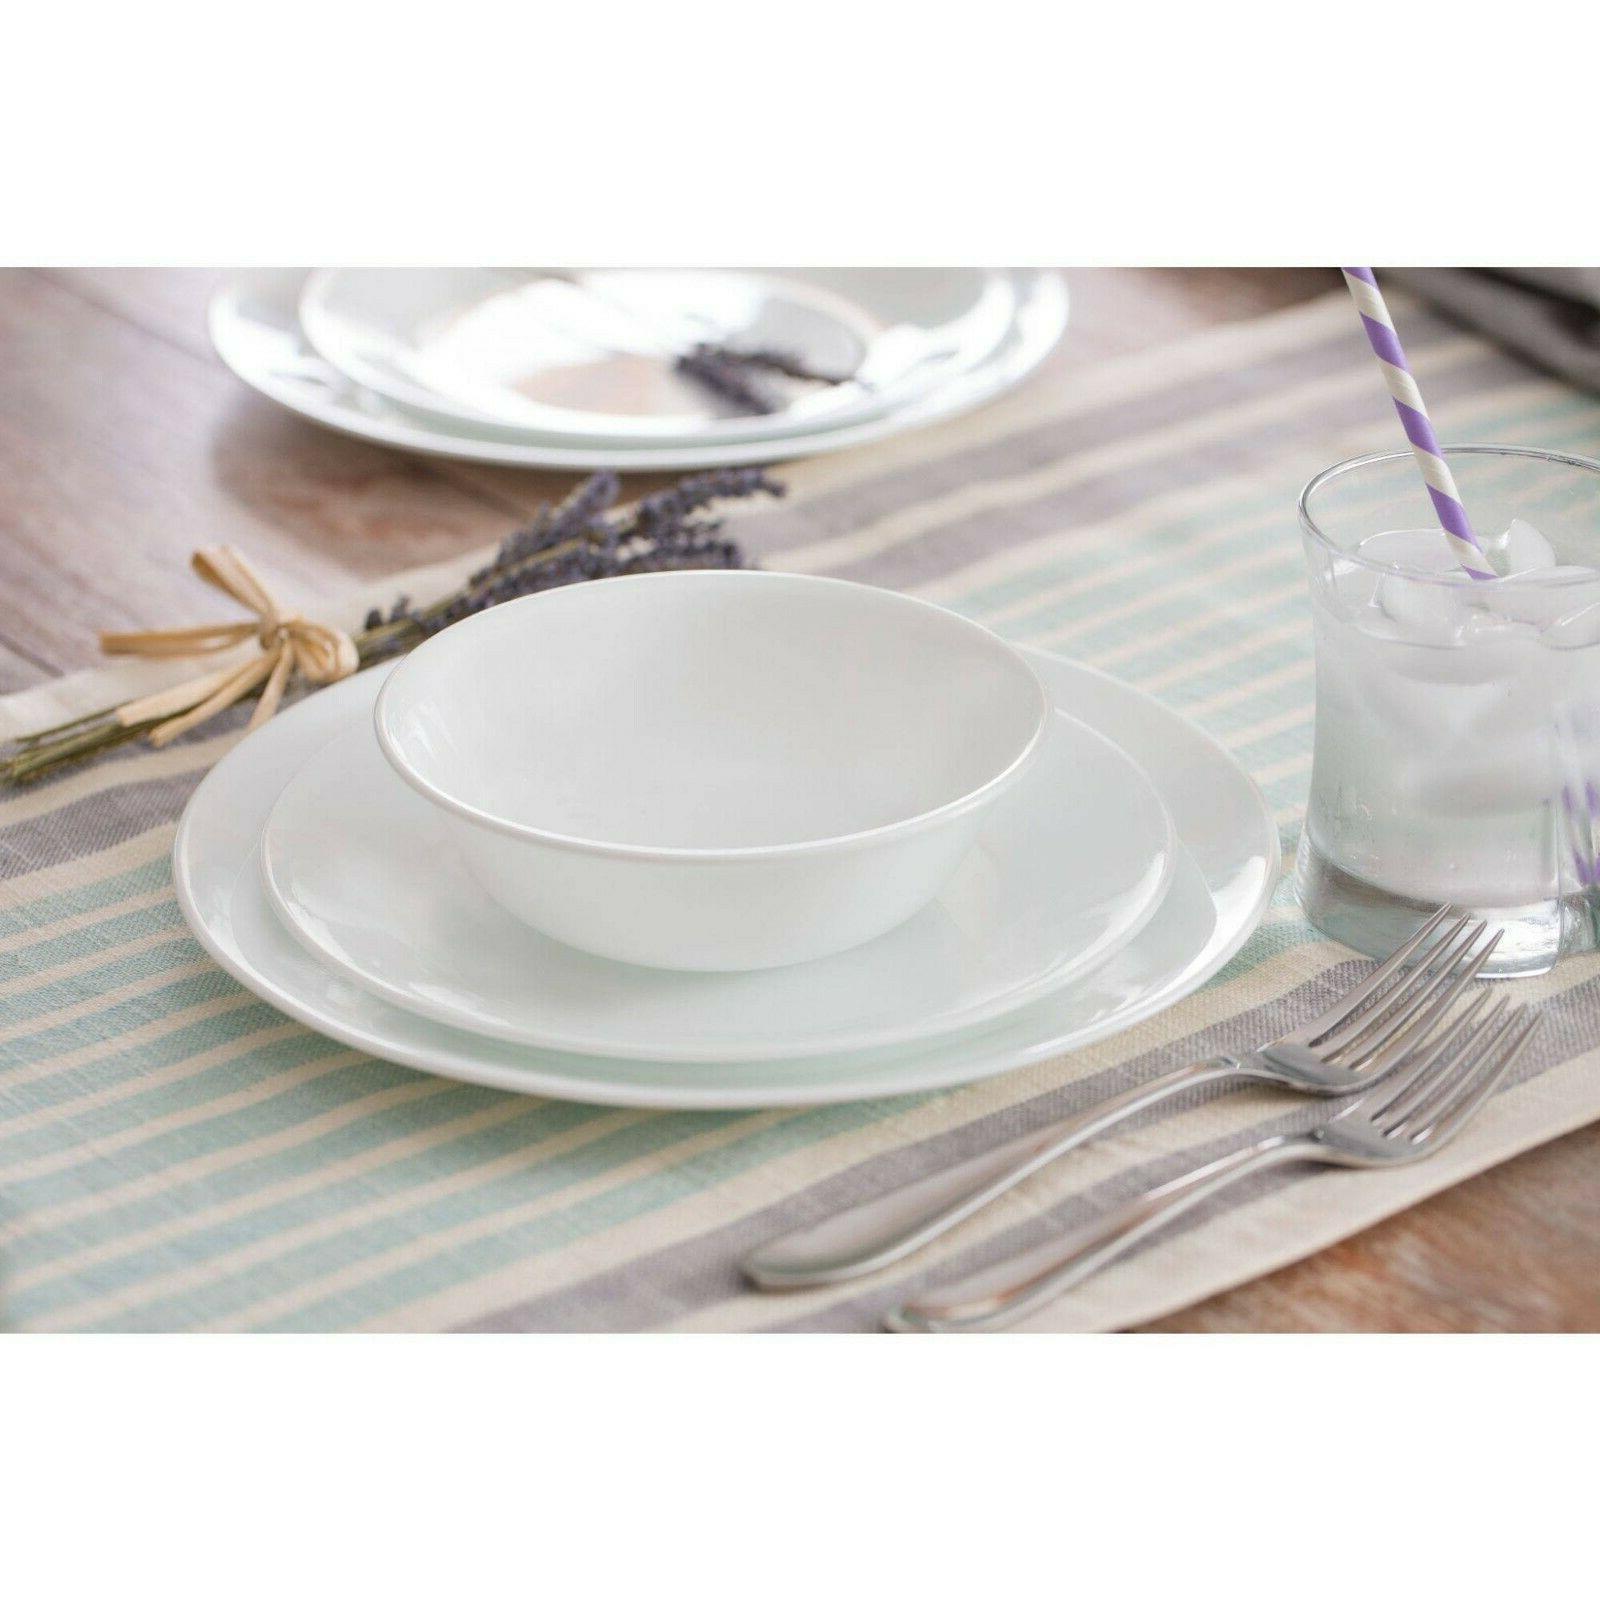 Corelle Livingware Winter White Dinnerware Set, Piece